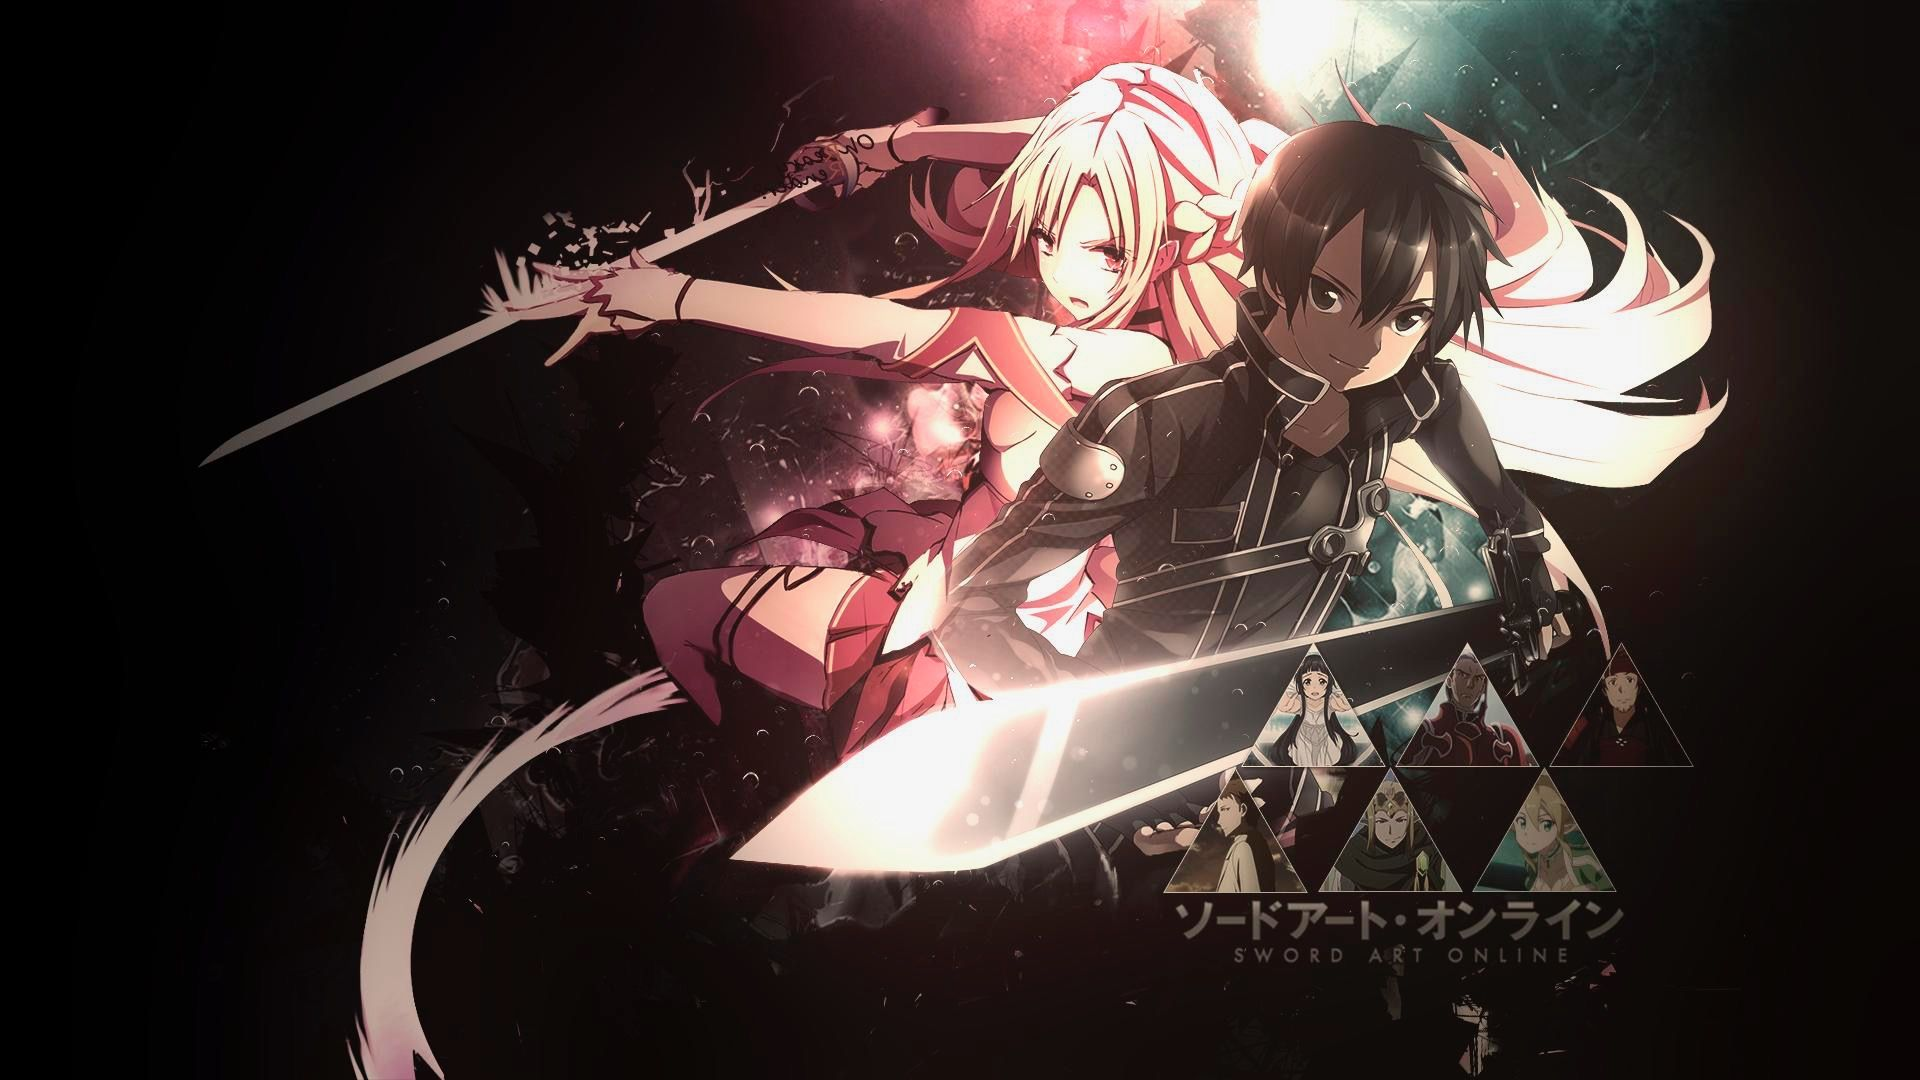 Pin by abc on anime Sword art online wallpaper, Sword